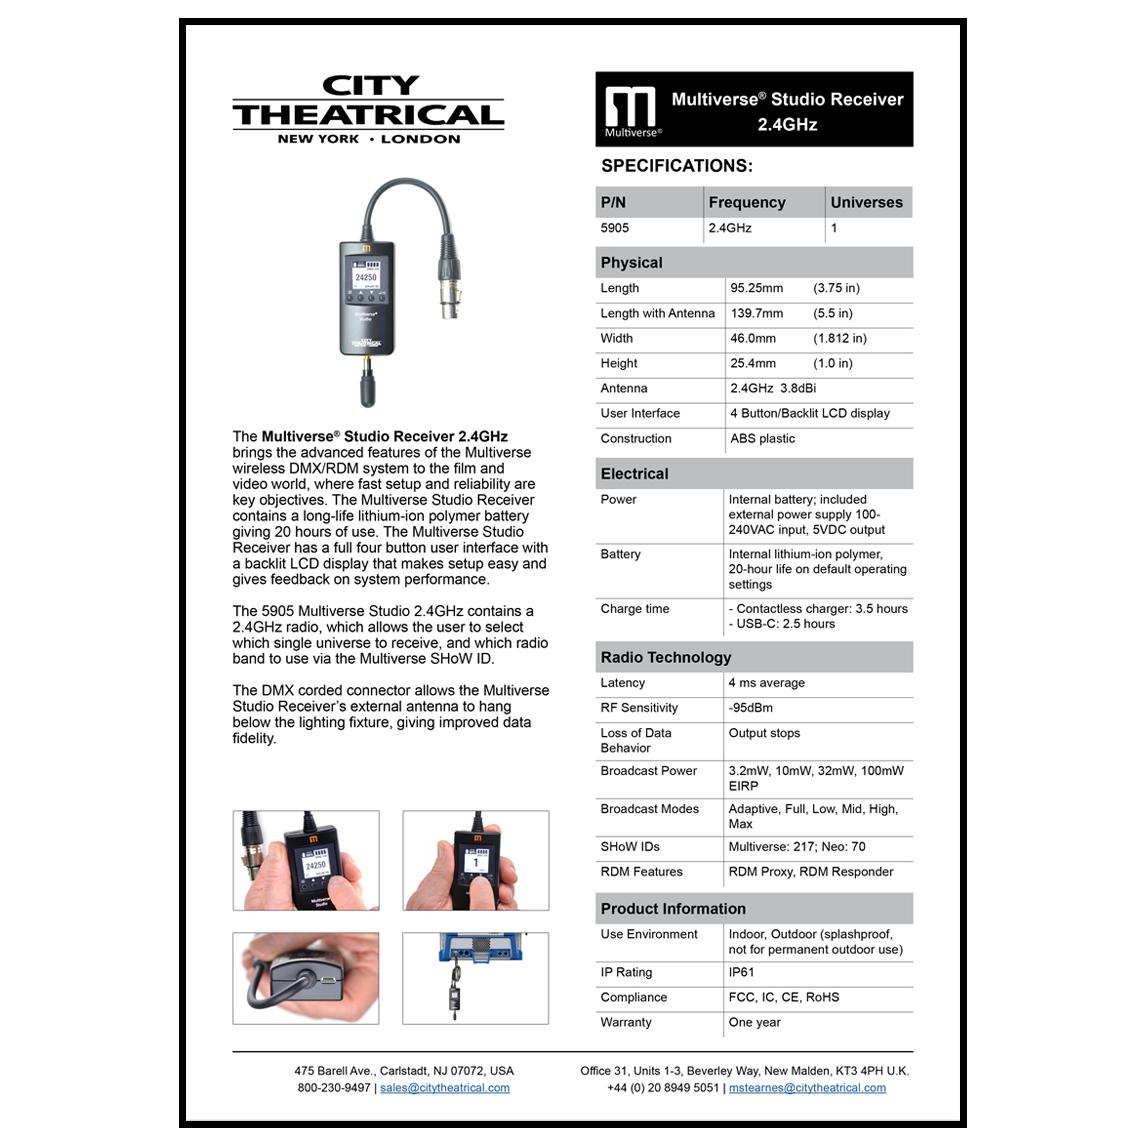 5905 Multiverse Studio Receiver Cut Sheet